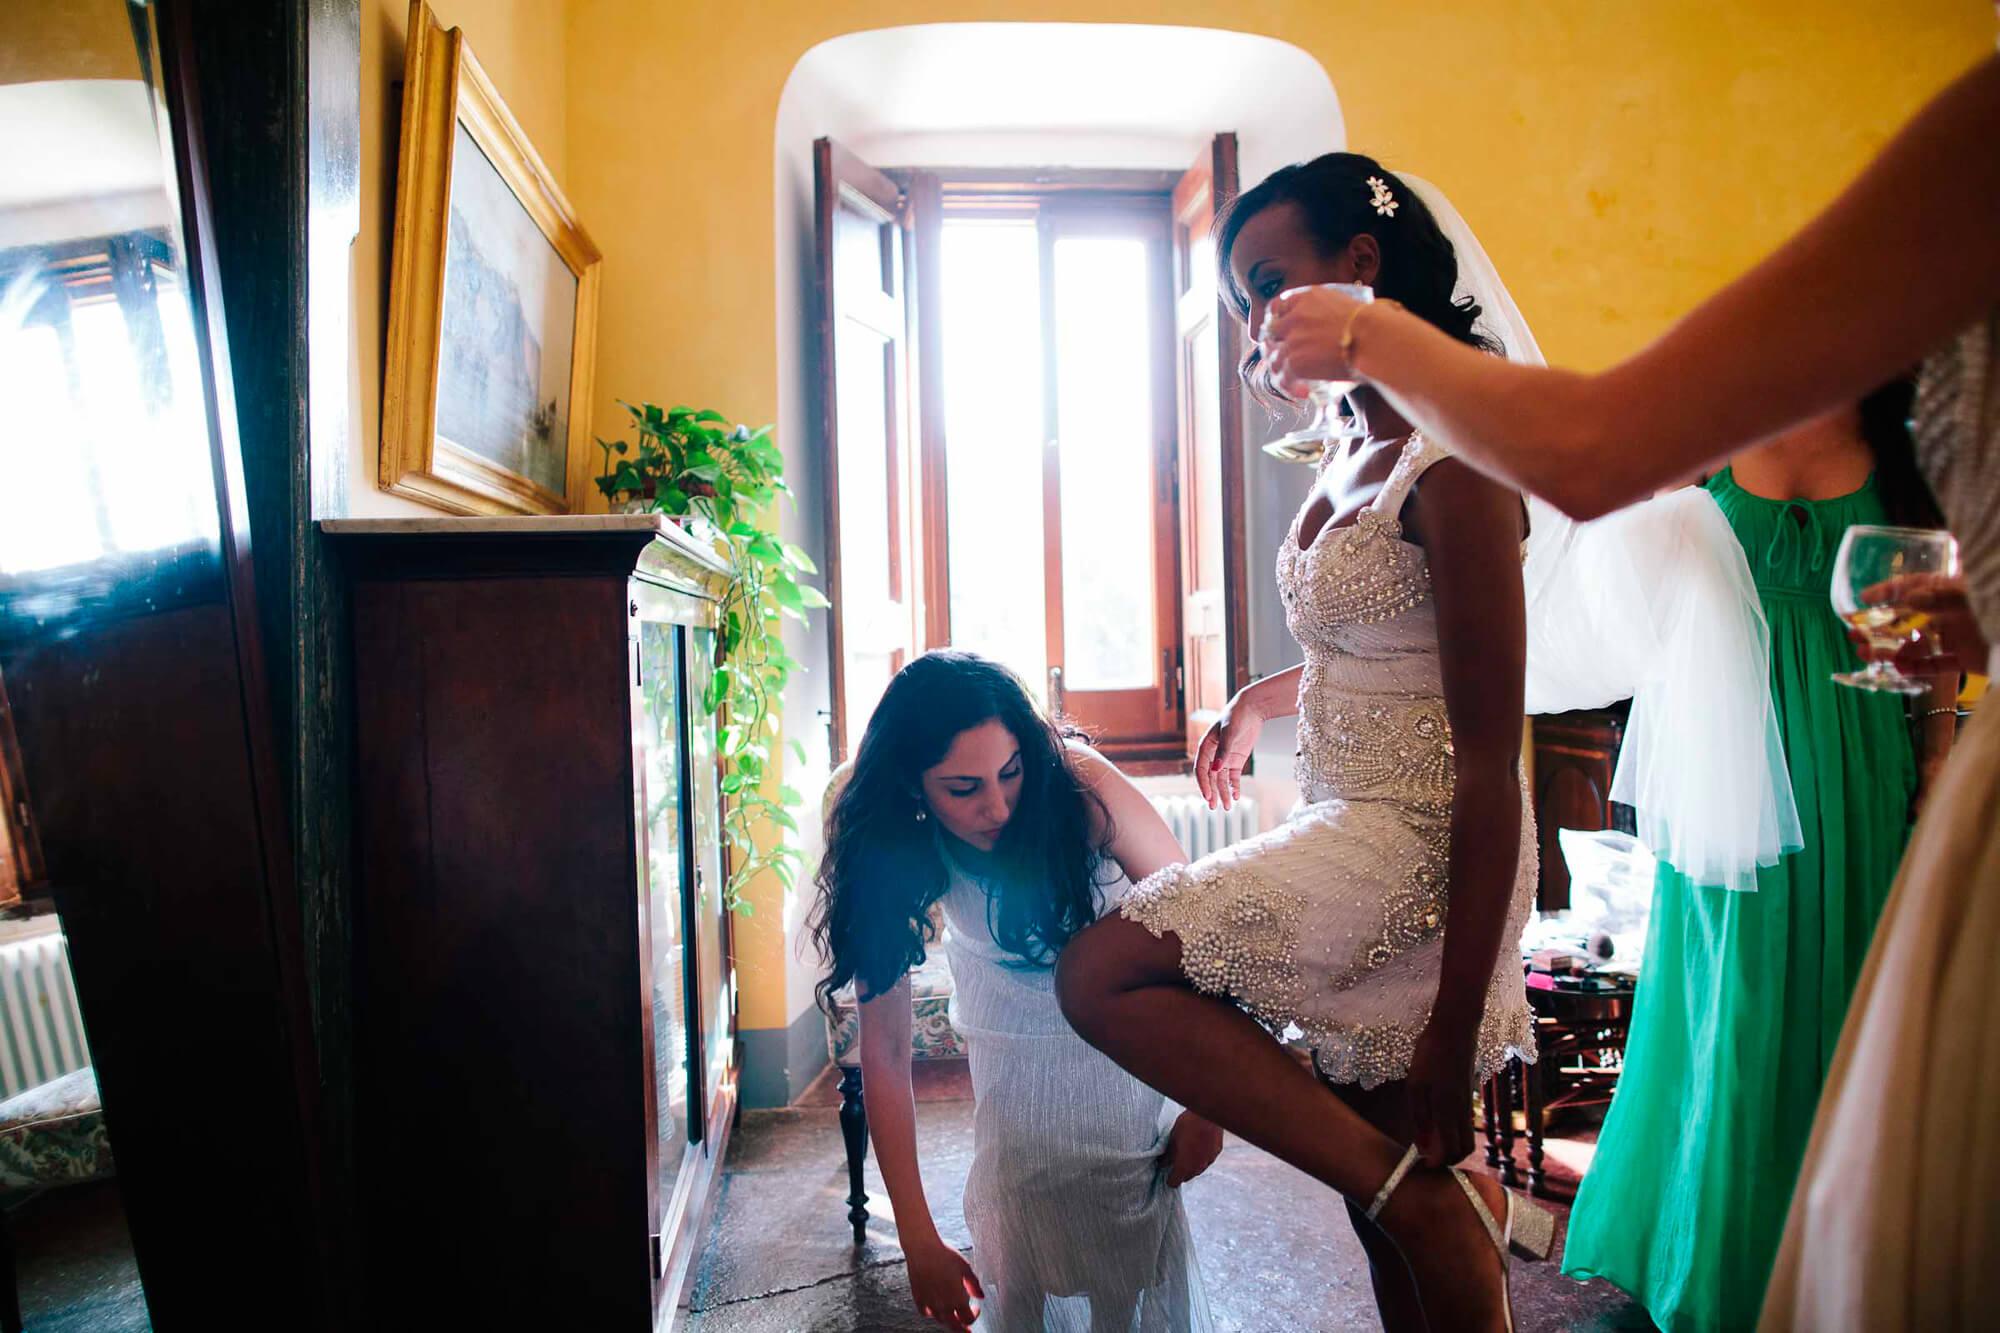 048-sorrento-wedding-photographer.jpg